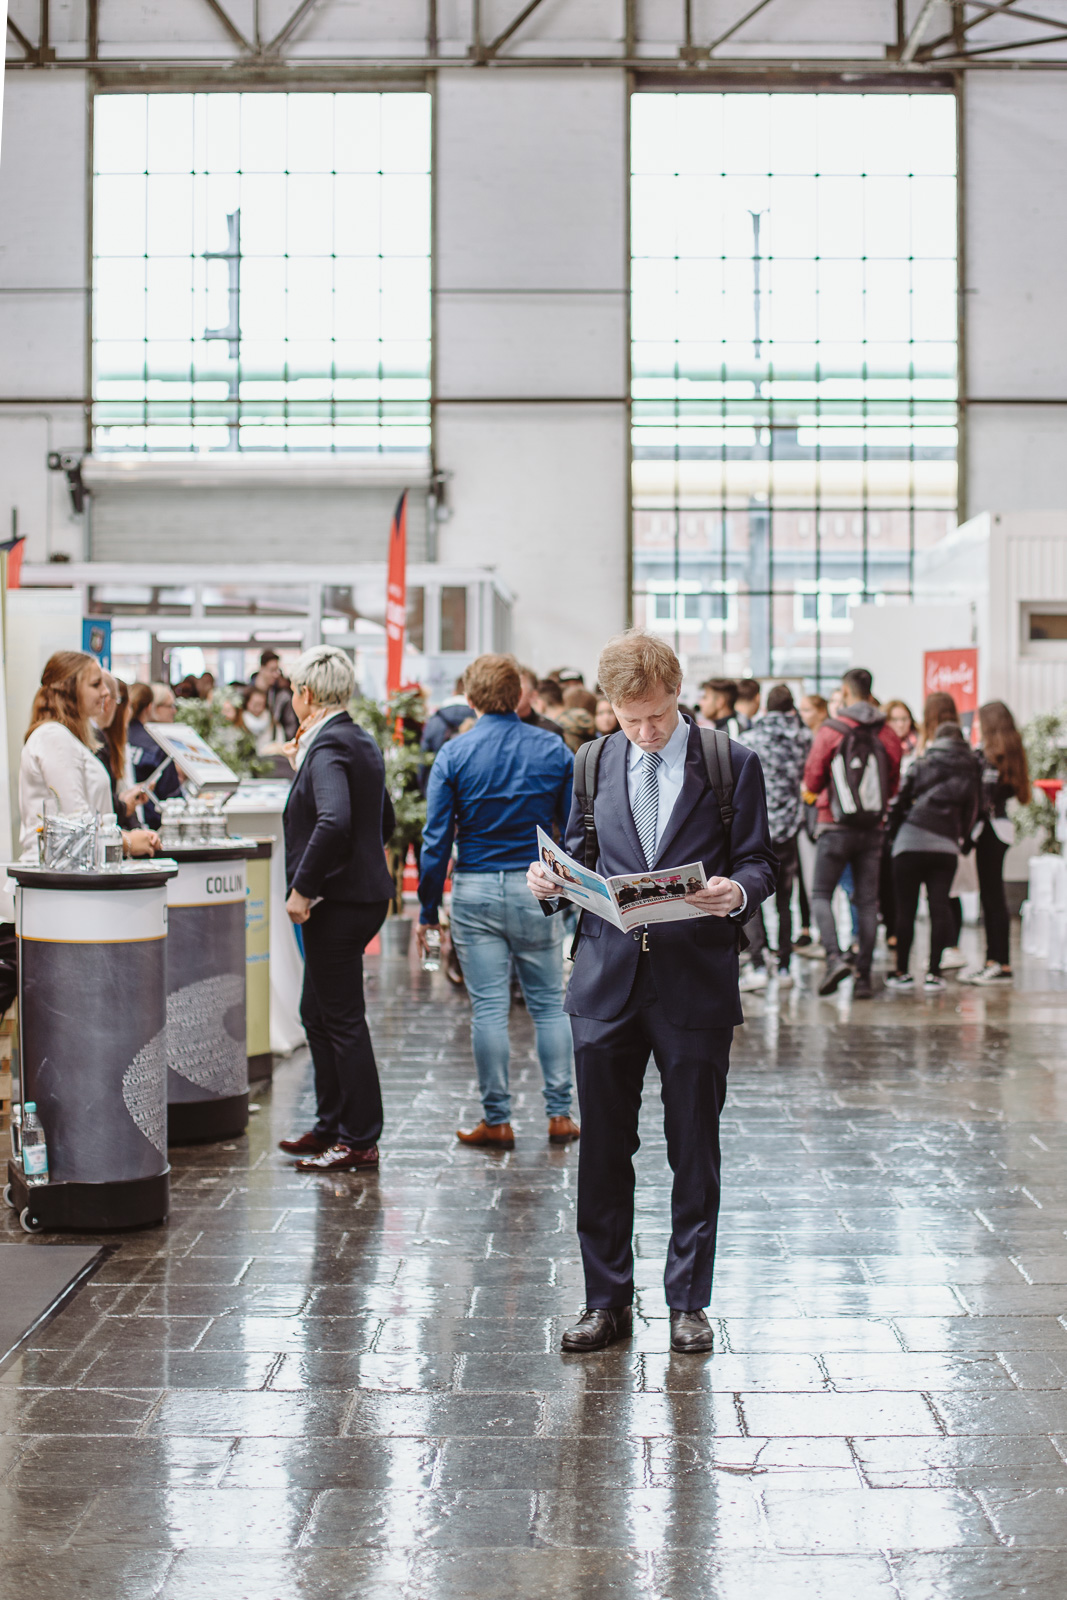 Messefotografie - Reportagefotografie - viele Besucher -Karrieretag